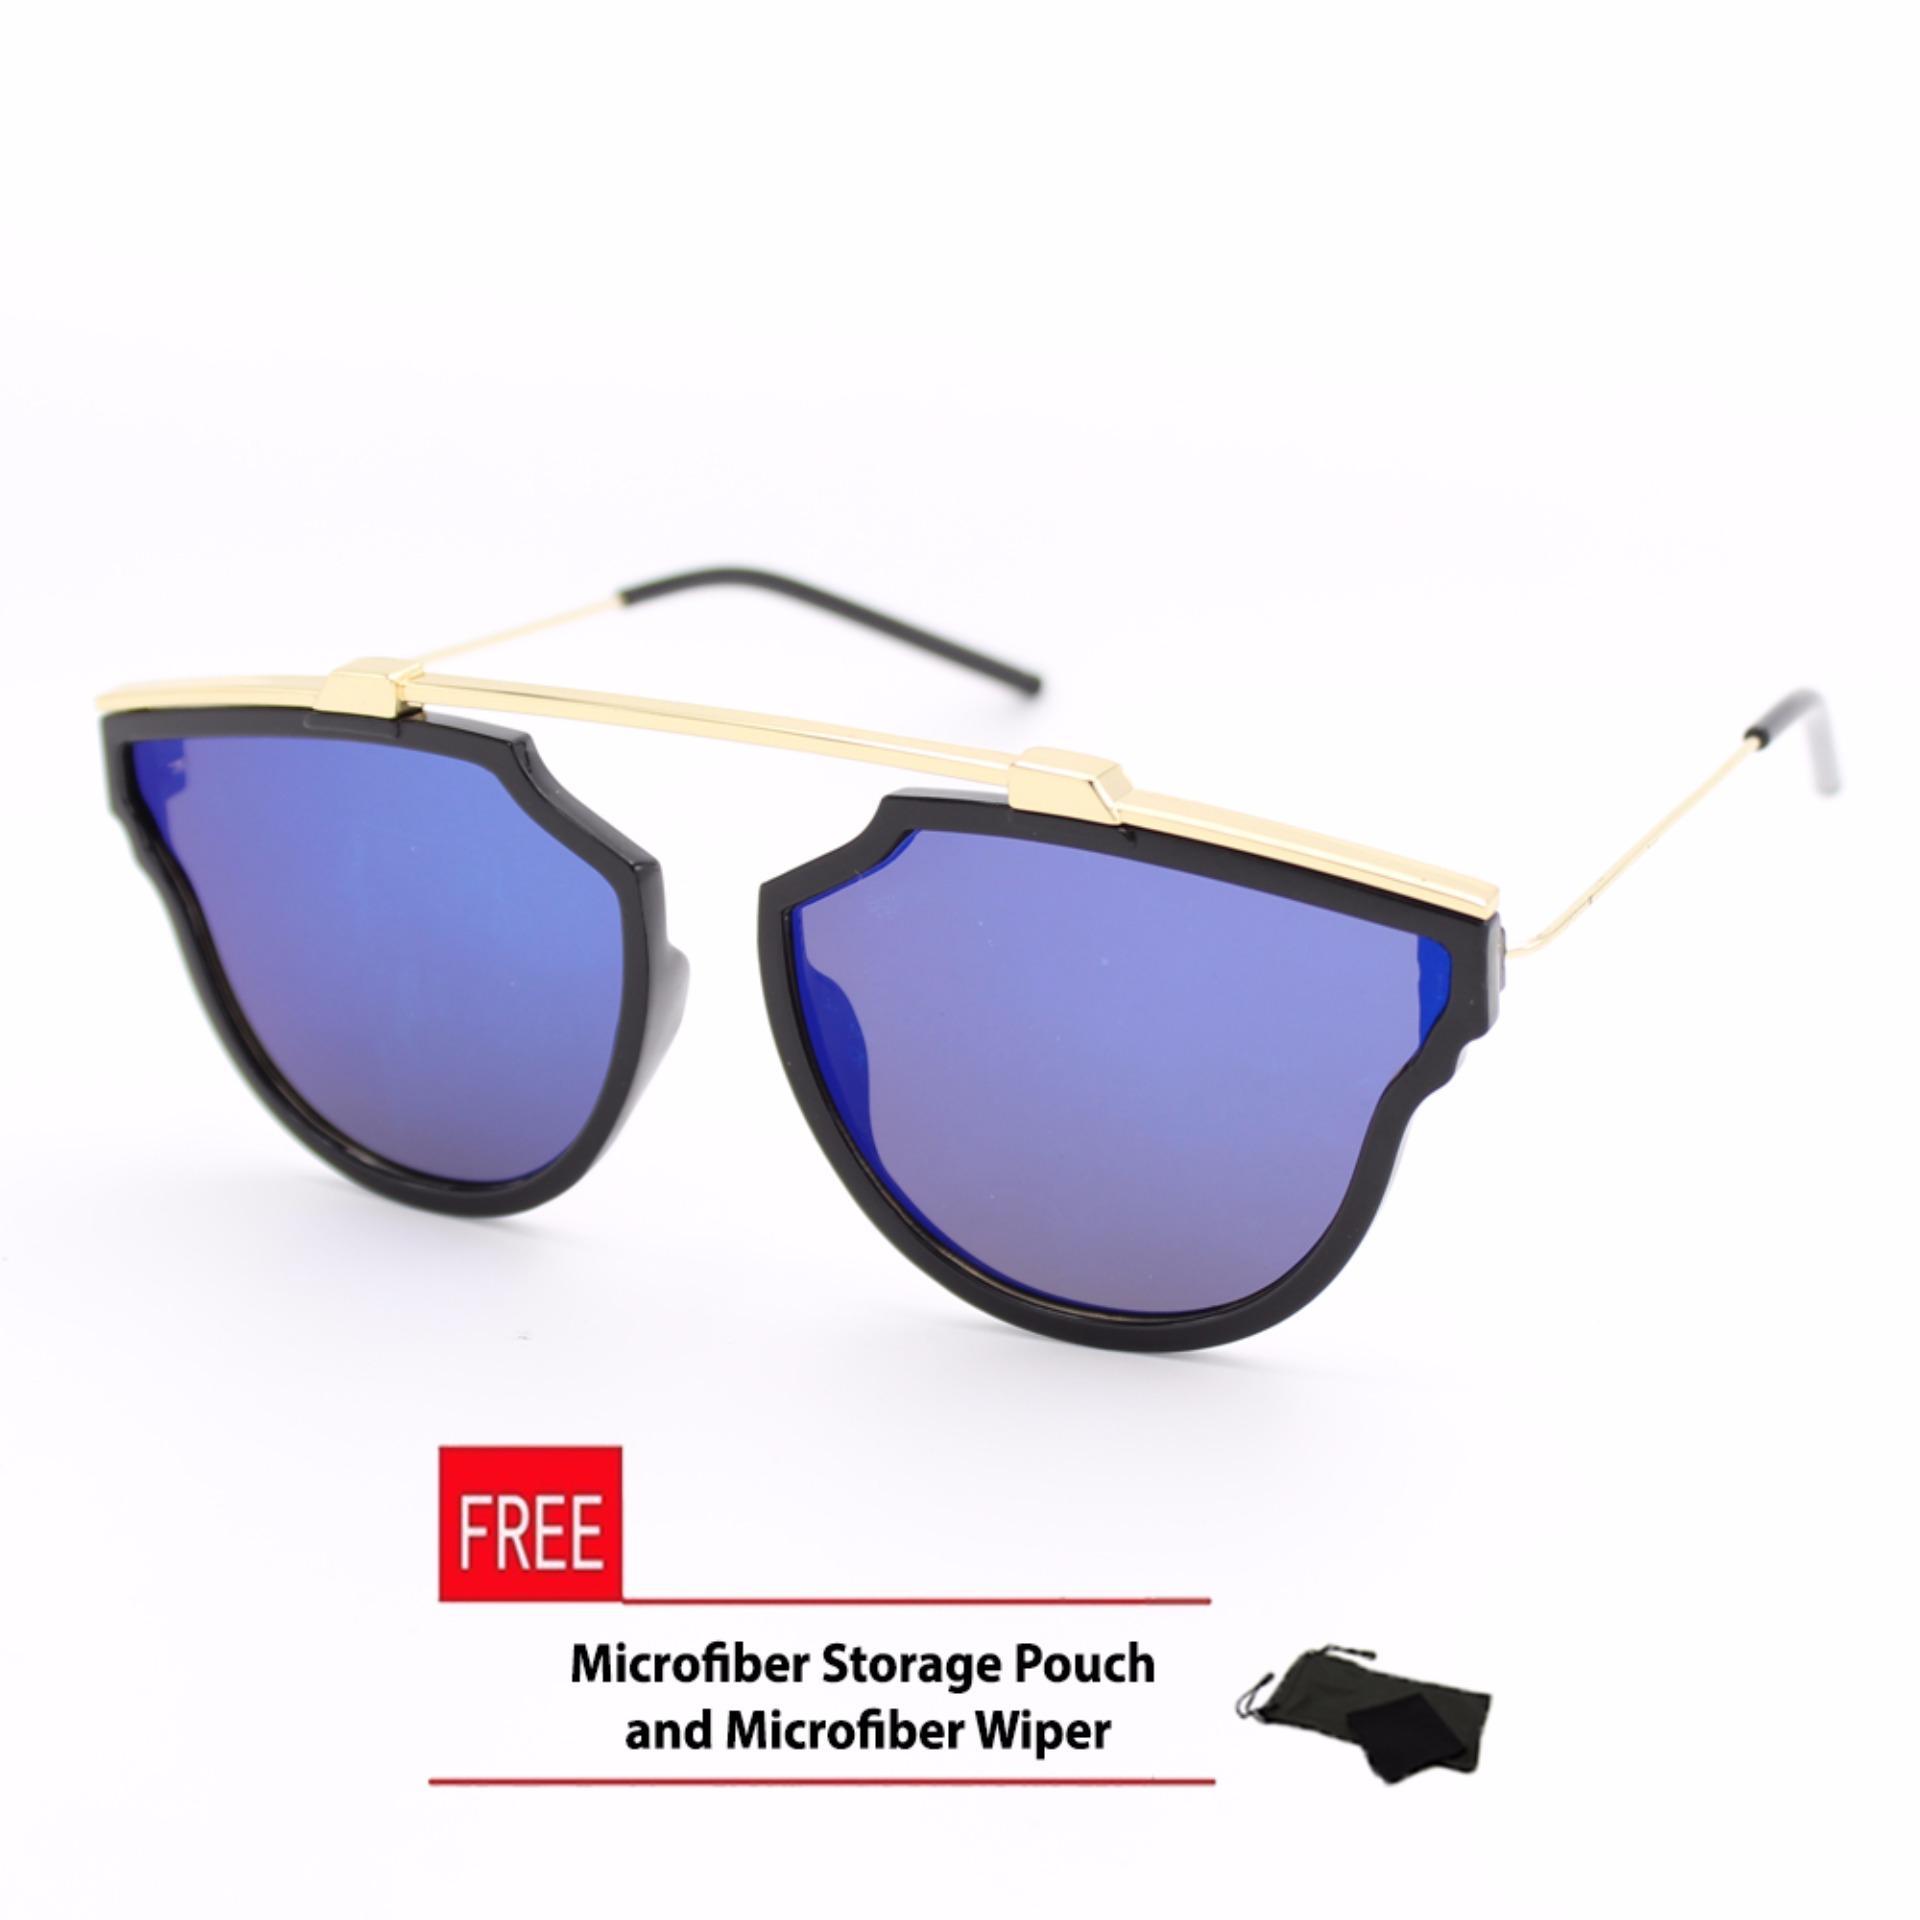 075ecef6214 Reflective aviator sunglasses black frame with blue lens lazada jpg 999x999  Basketball shaped sunglasses